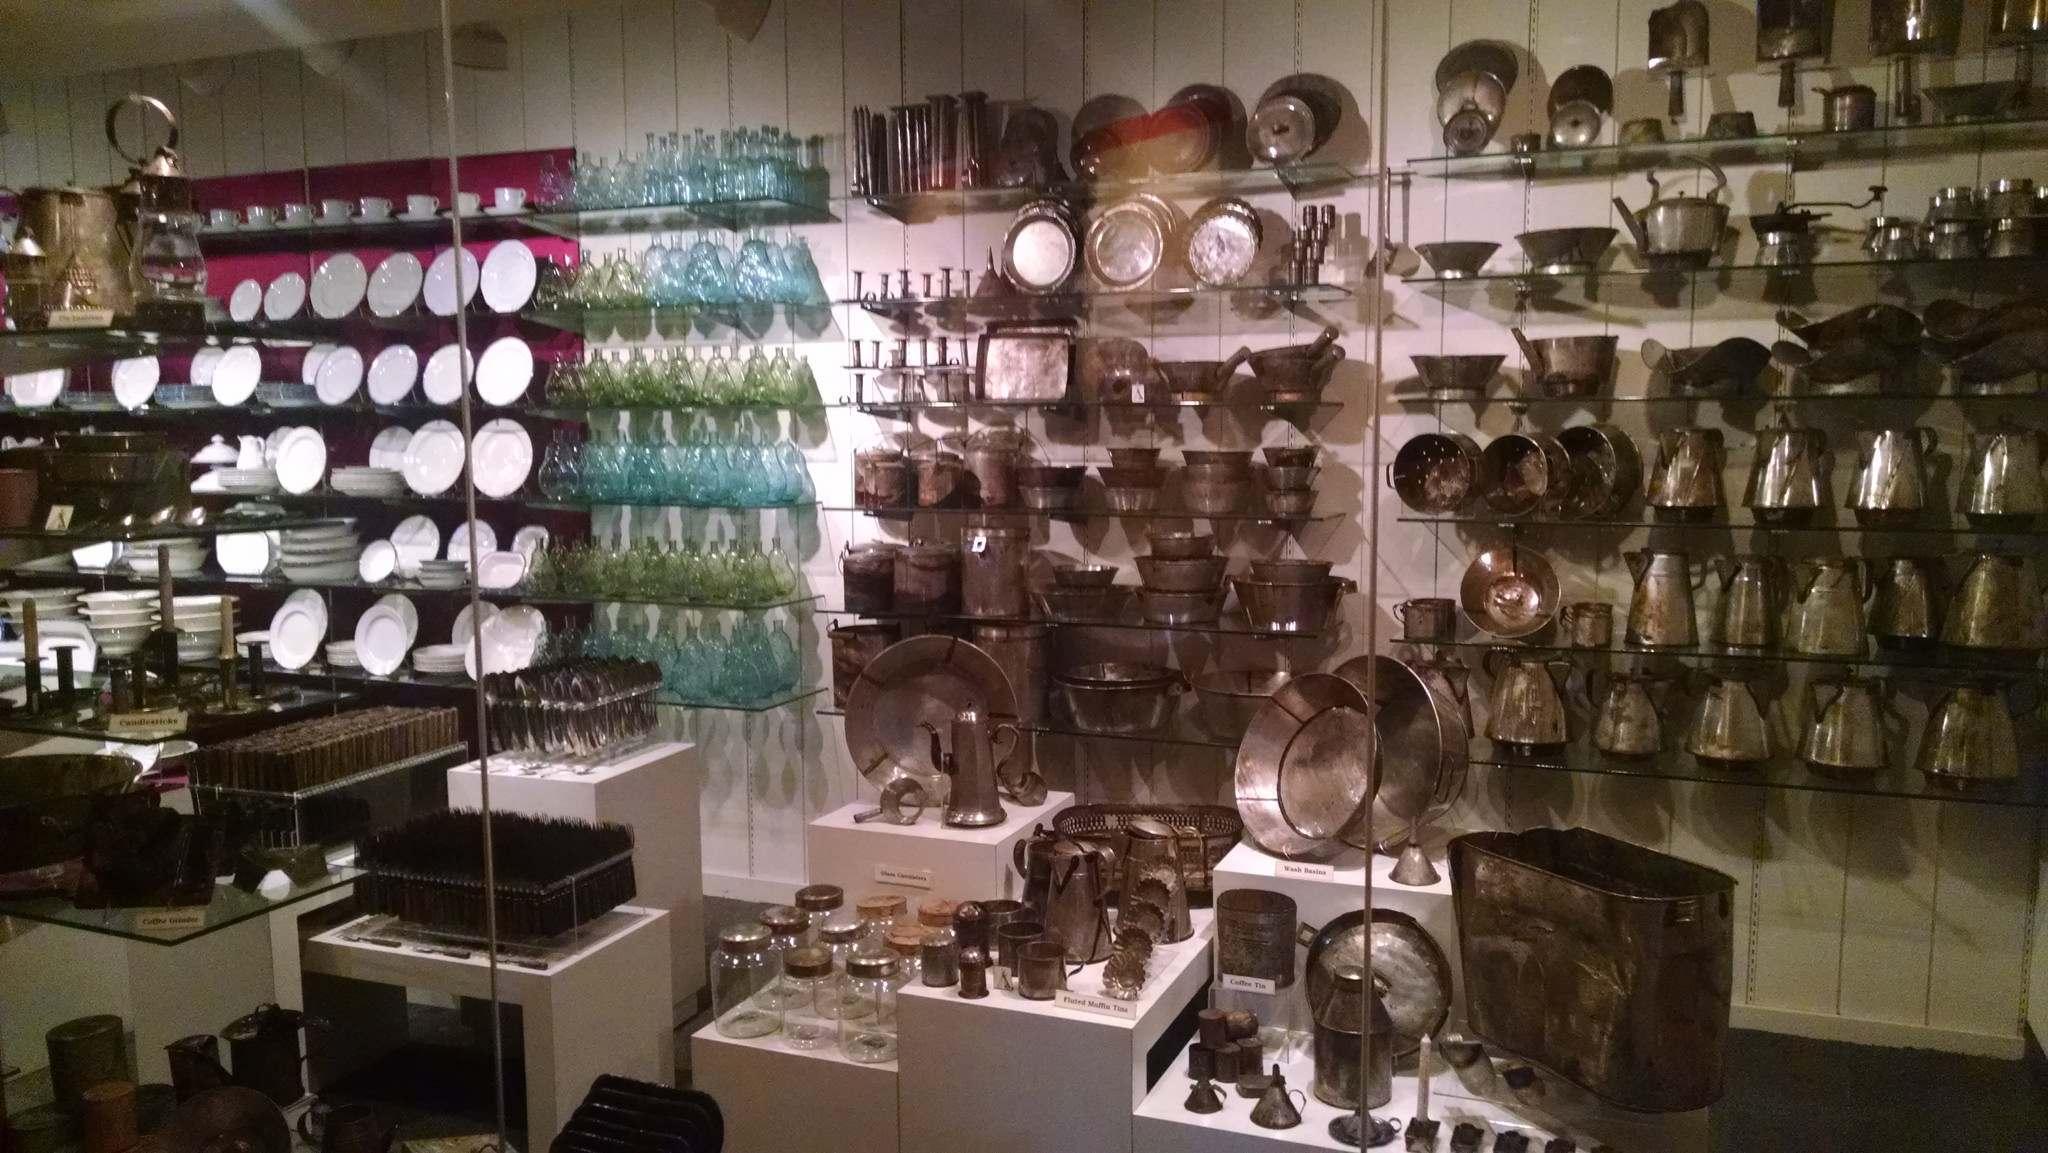 steamboat arabia3 History of Pioneering Midwest   Steamboat Arabia Museum in Kansas City